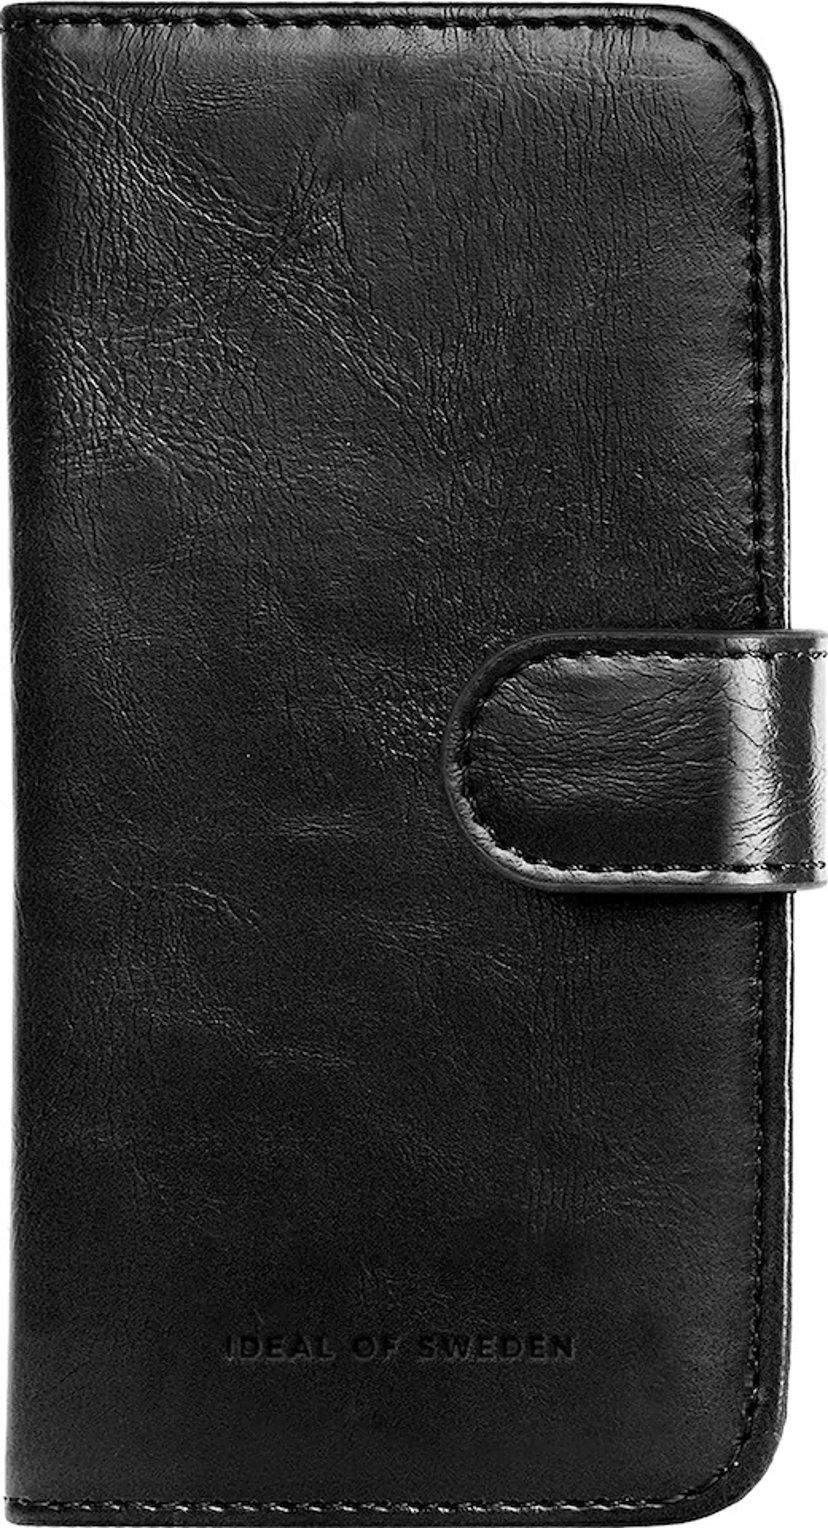 iDeal of Sweden Magnet Wallet+ iPhone 12, iPhone 12 Pro Sort